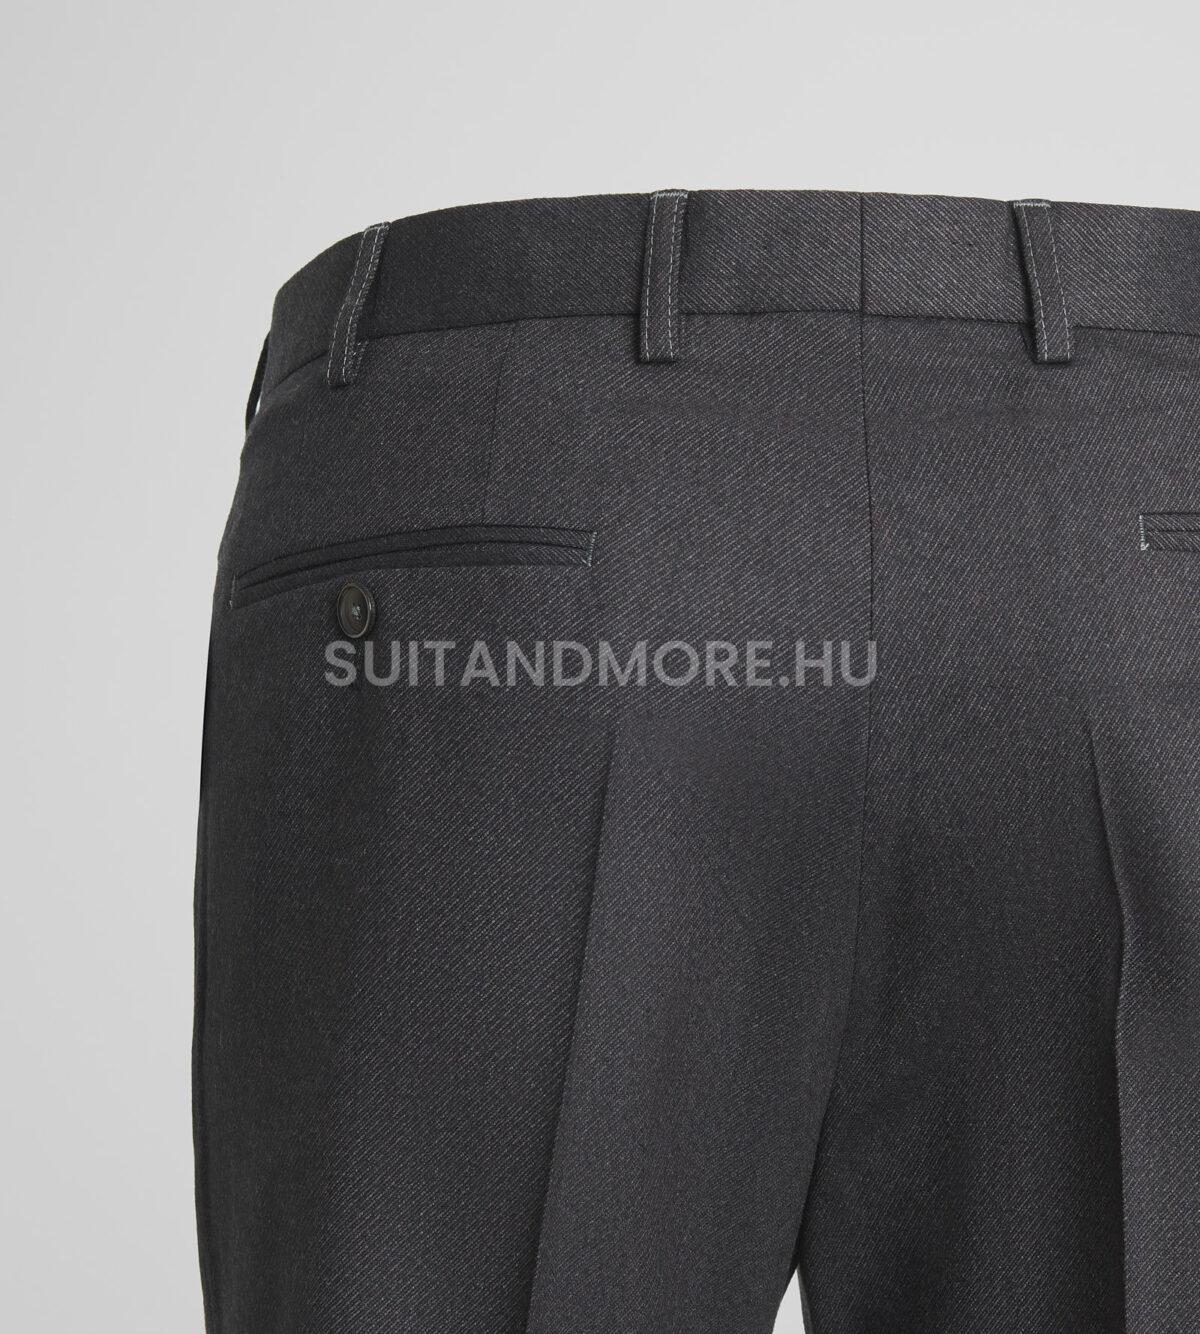 sötétszürke-modern-fit-gyapjú-kevert-szövetnadrág-SERGIO-1281243-40-03